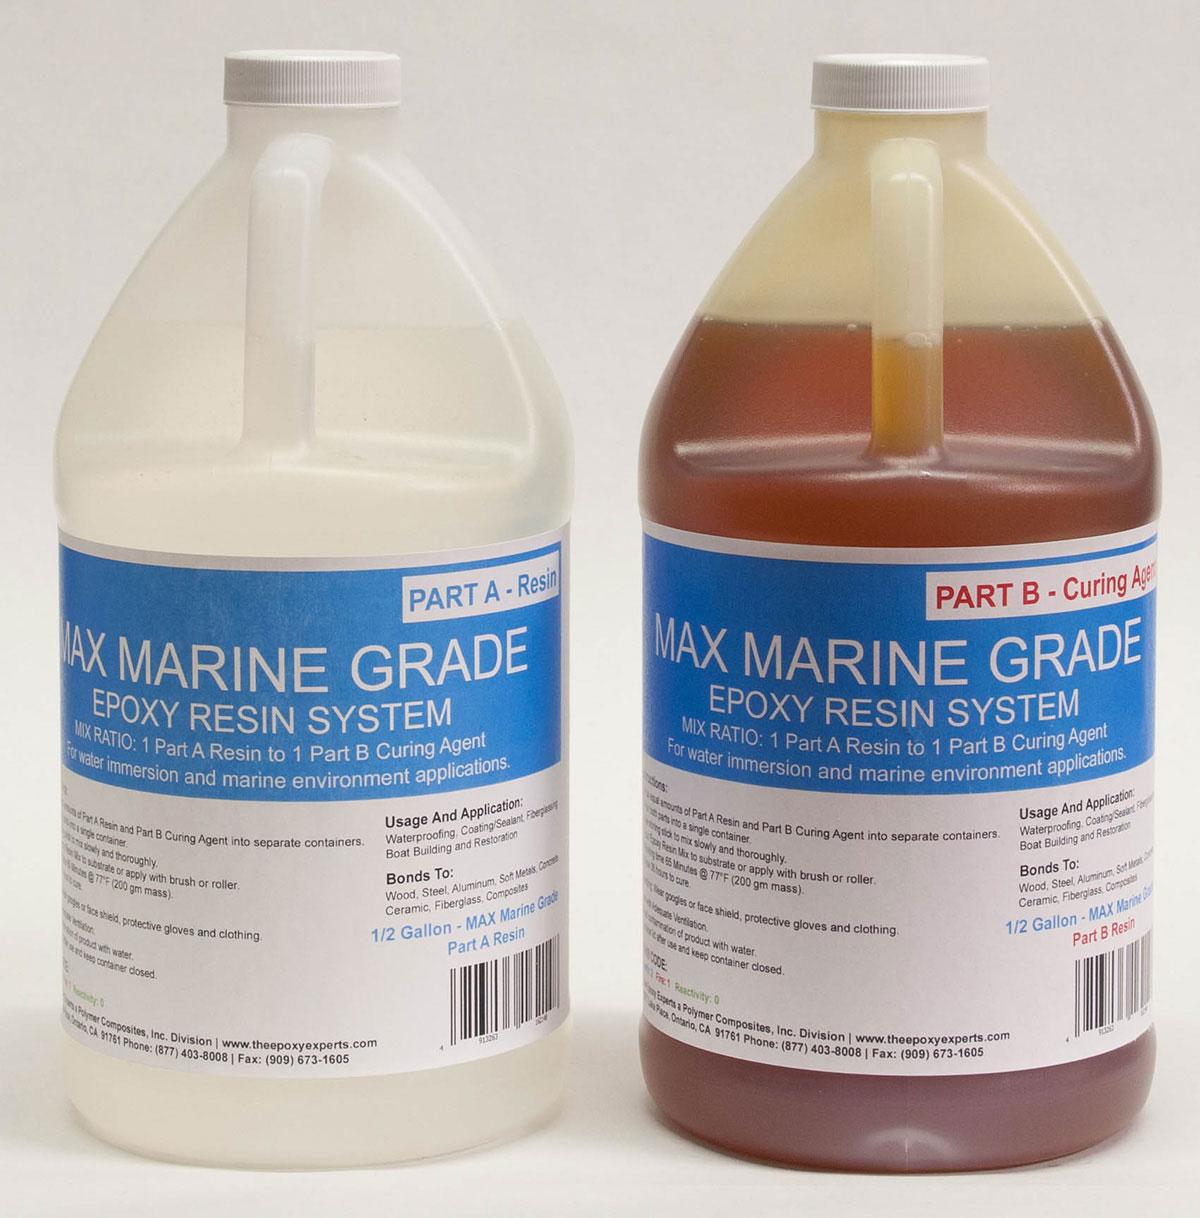 MAX MARINE GRADE Epoxy Resin System - 1 Gallon Kit - Wood Sealing, High  Strength Fiberglassing Marine Applications, Composite Fabricating Resin -  The